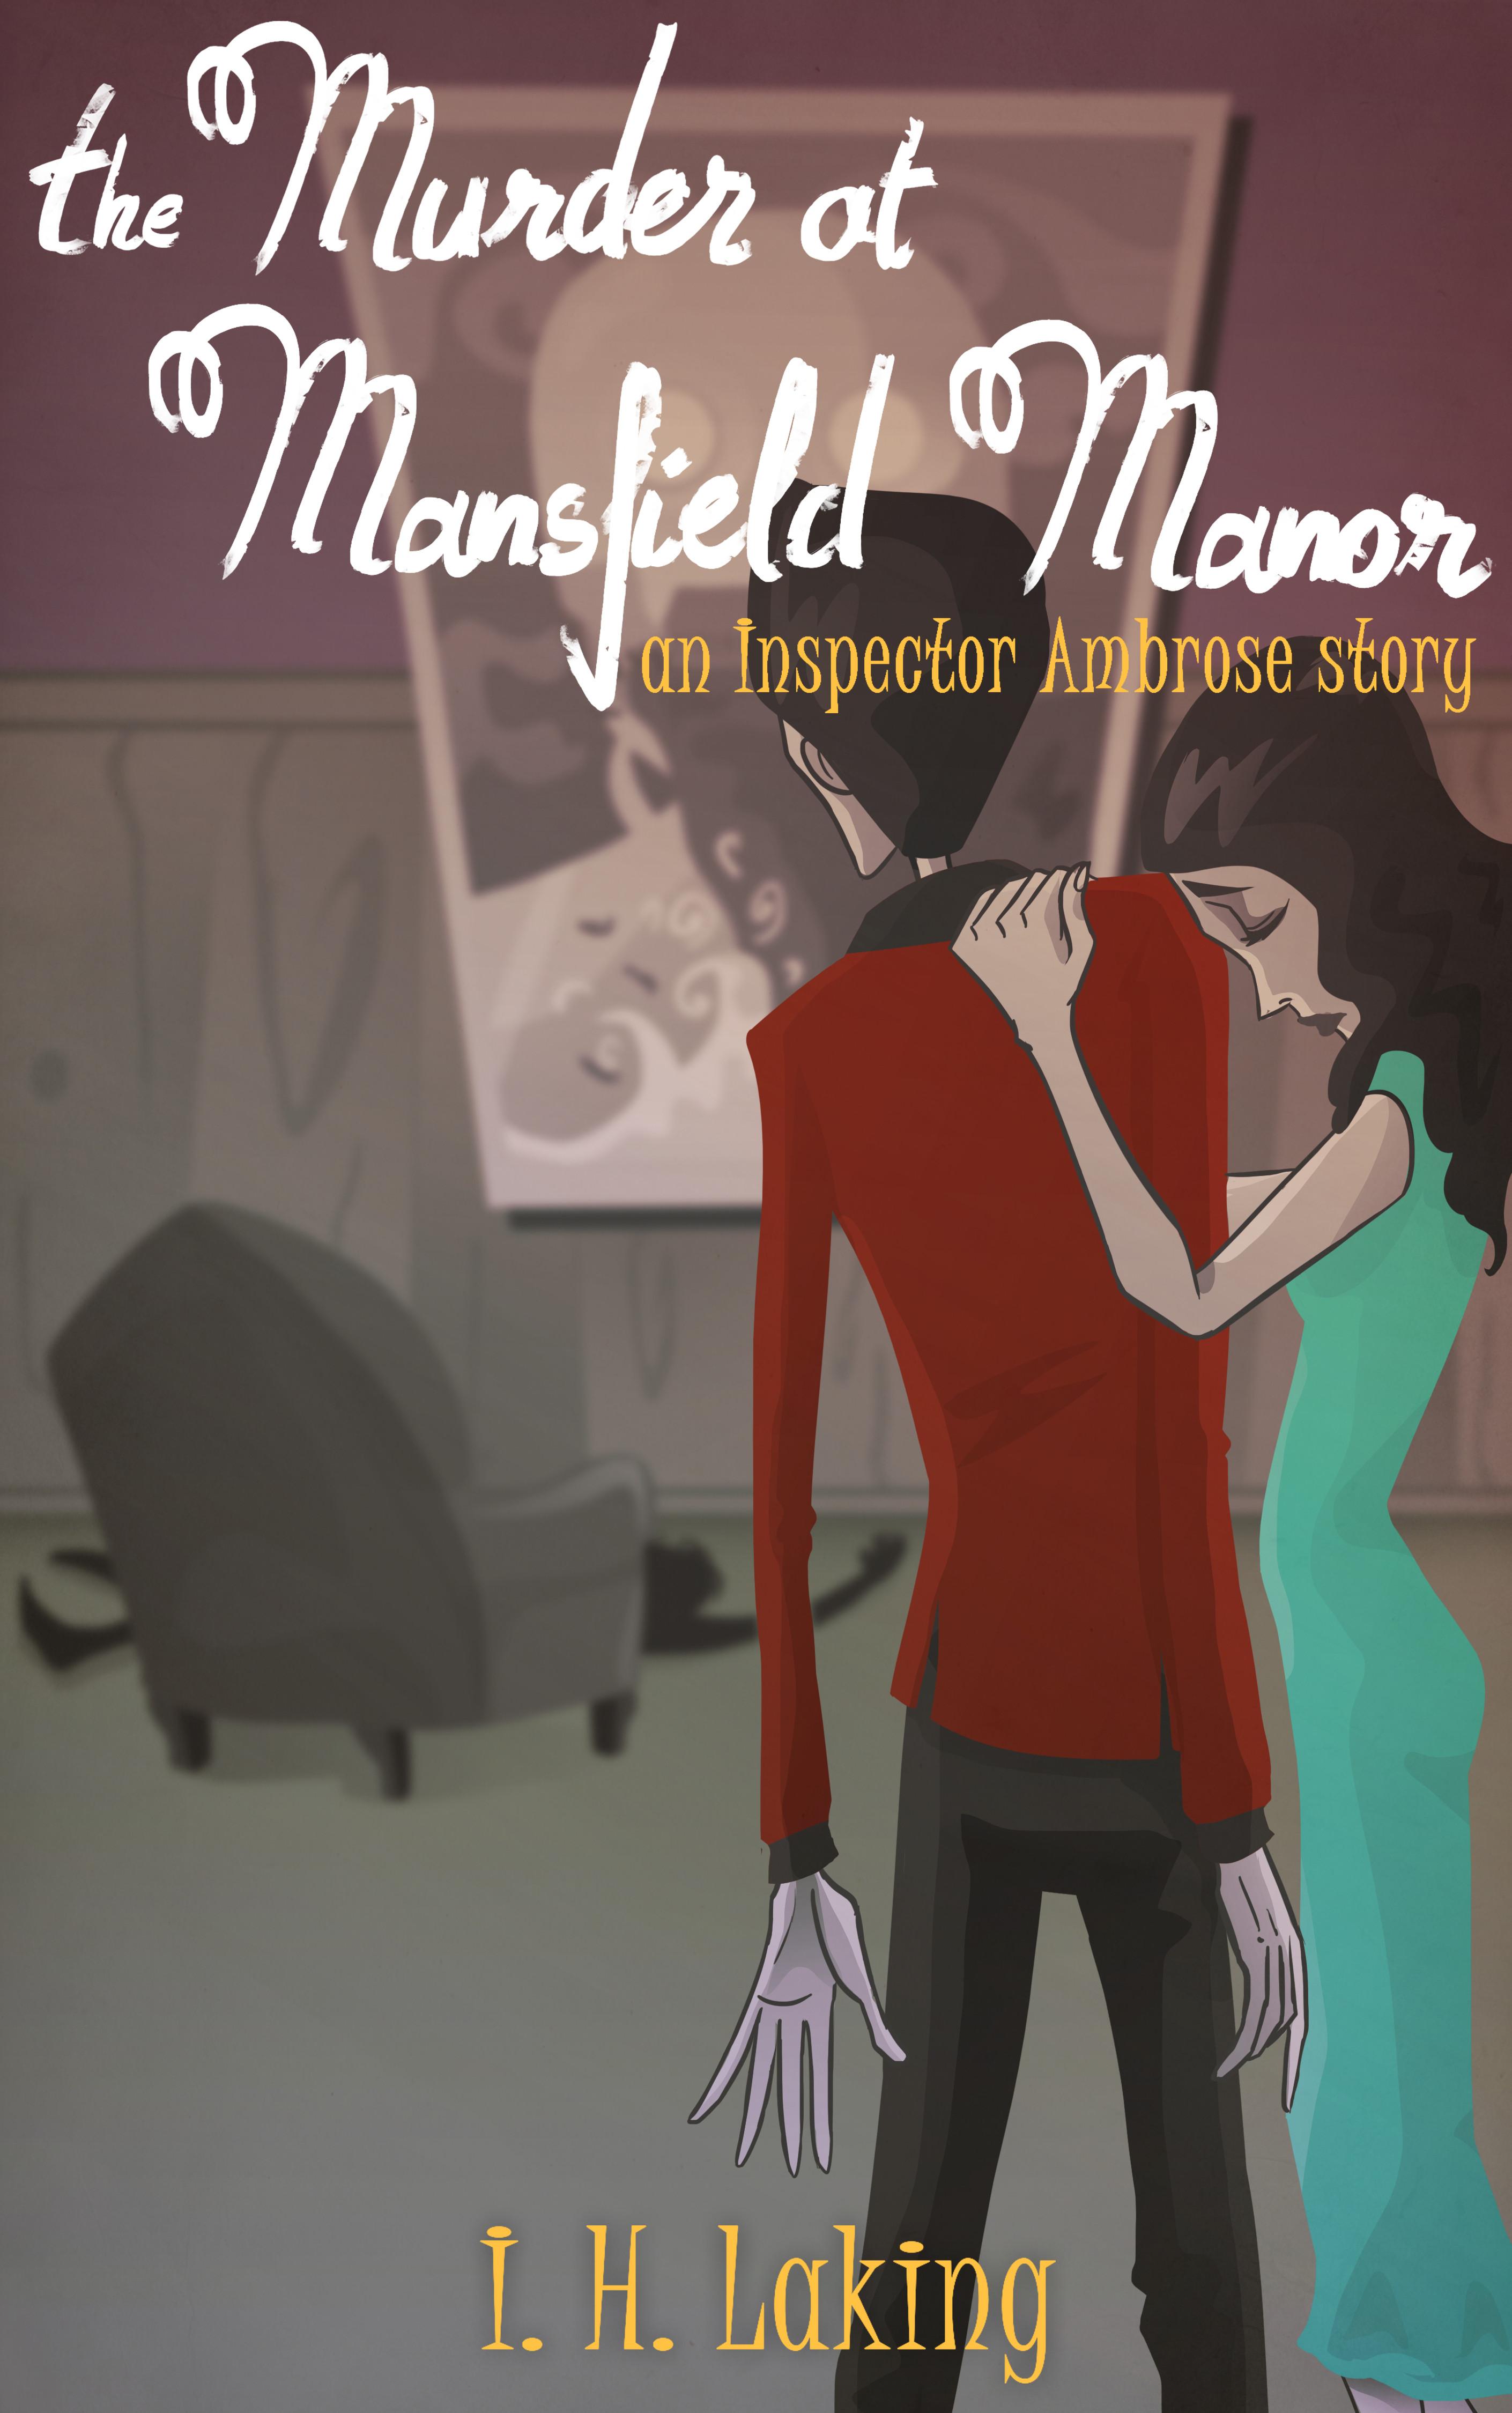 Cover Art for the Murder at Mansfield Manor by Blacksmiley via ArtCorgi Final